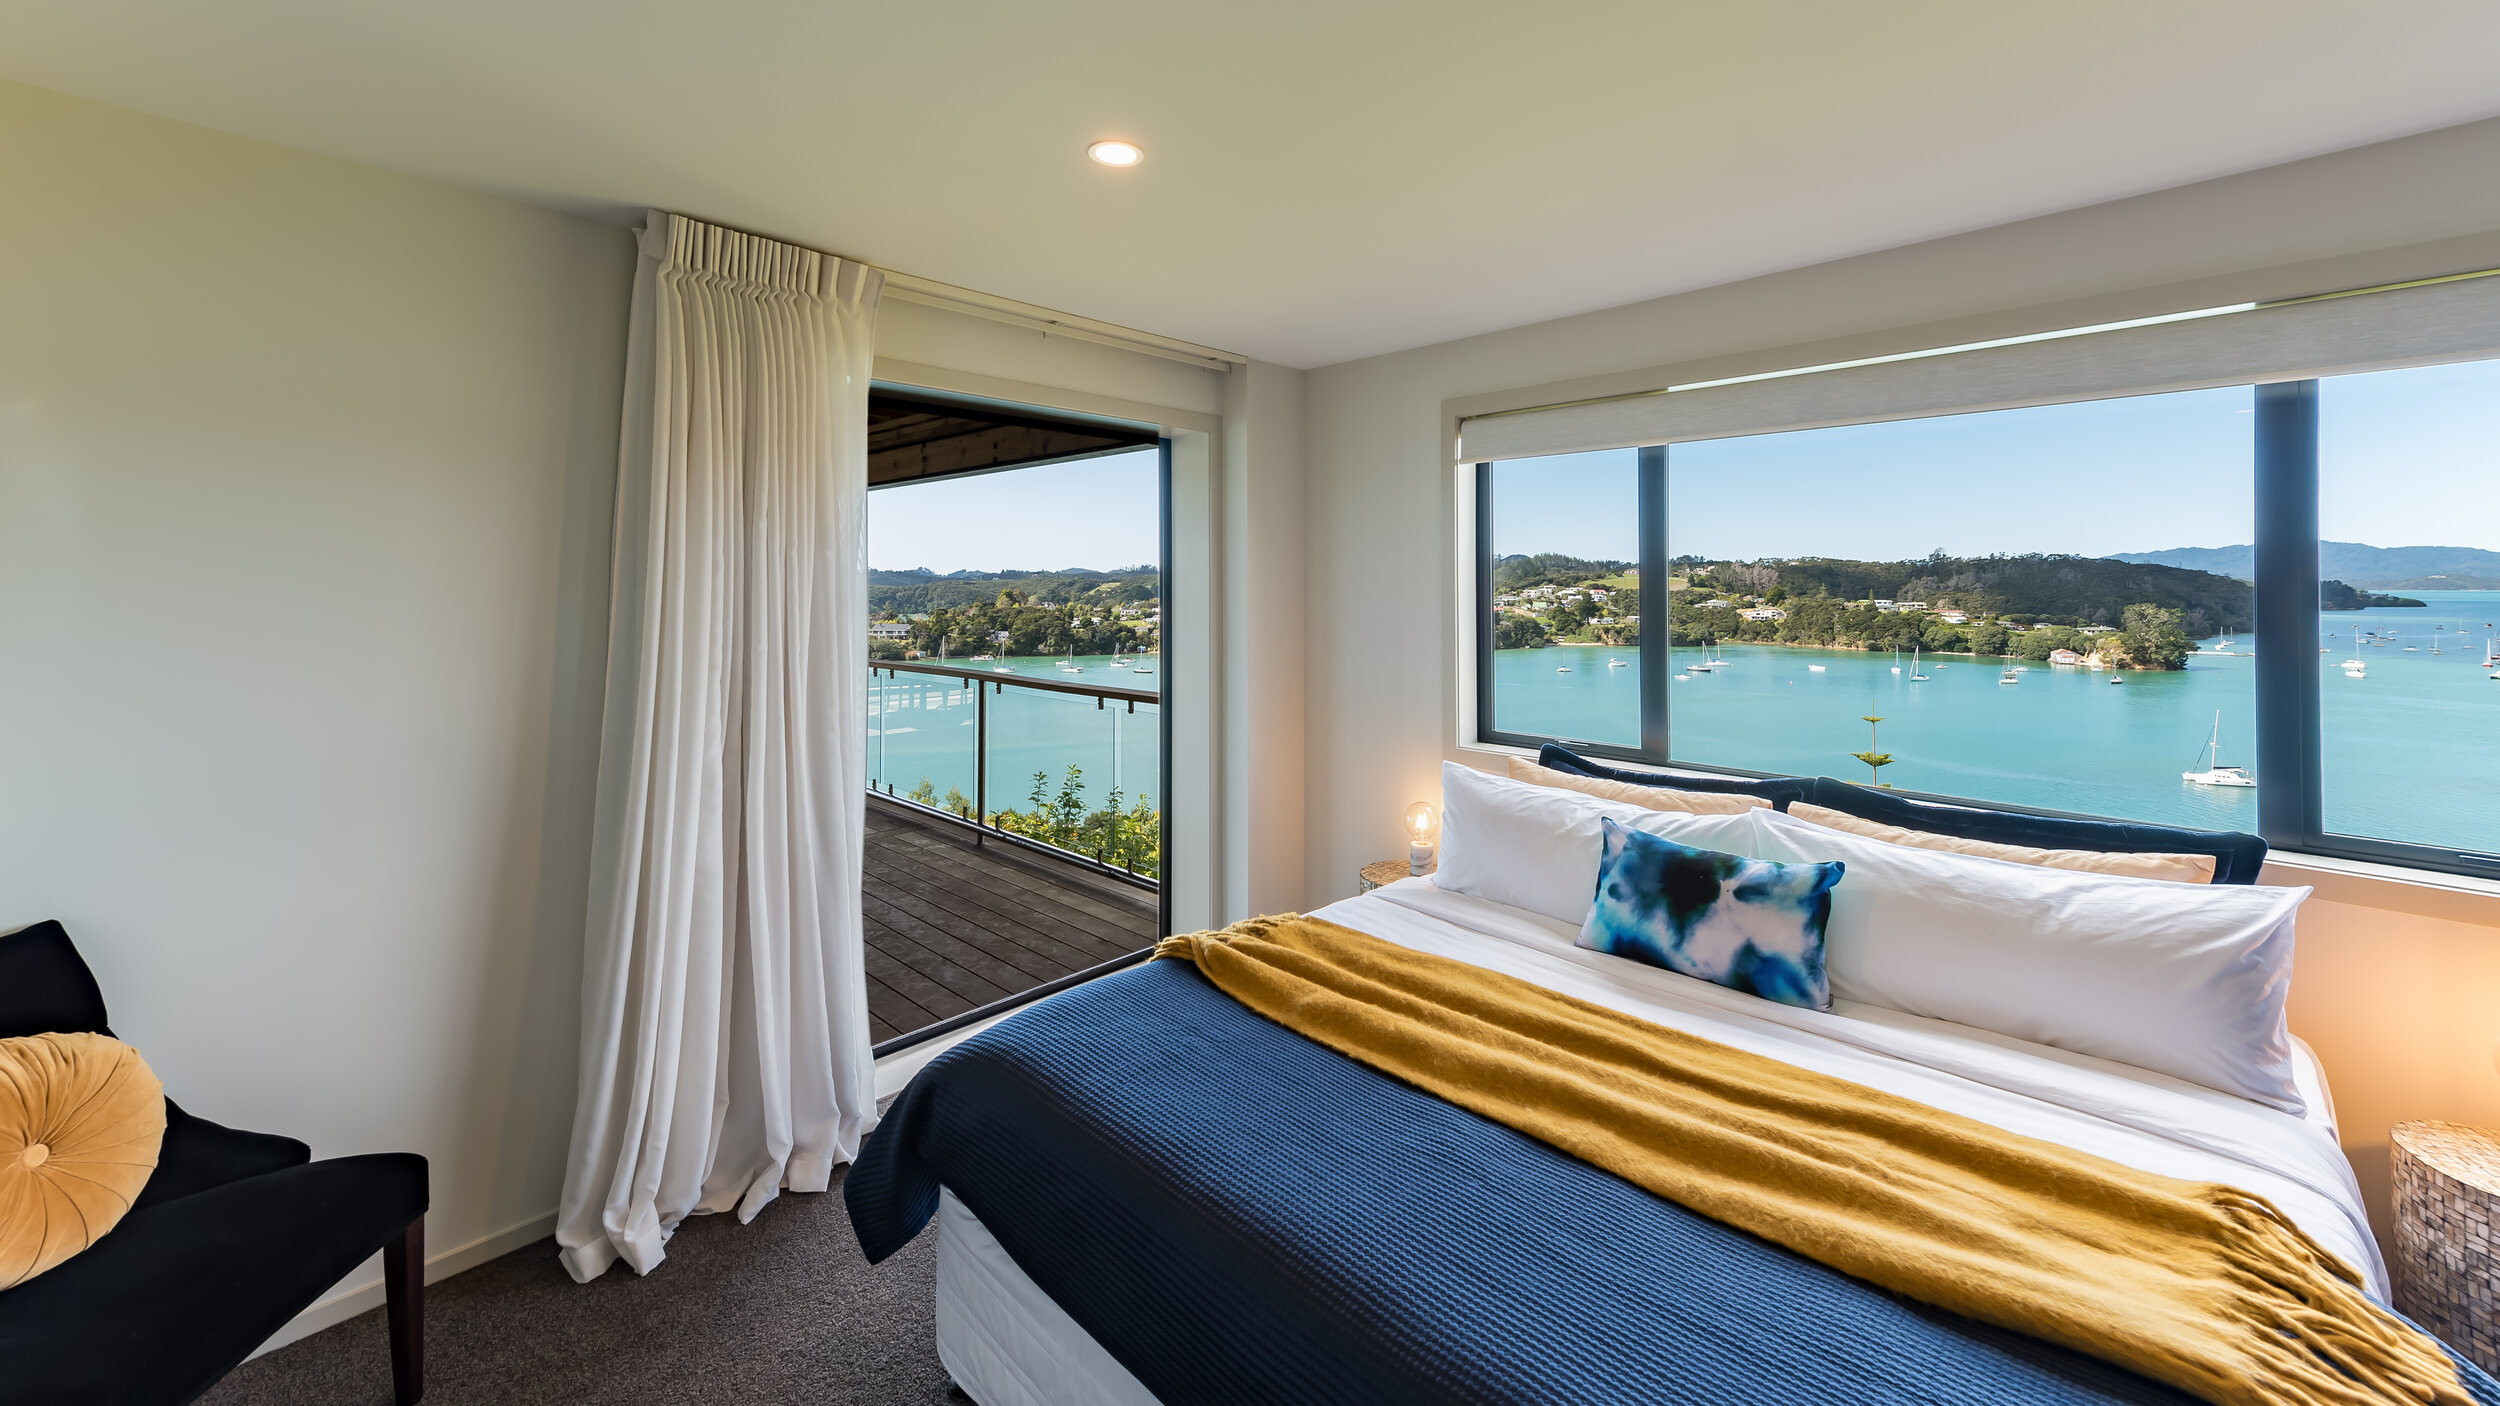 Marina Cove-59 Okiato Super King room.jpg